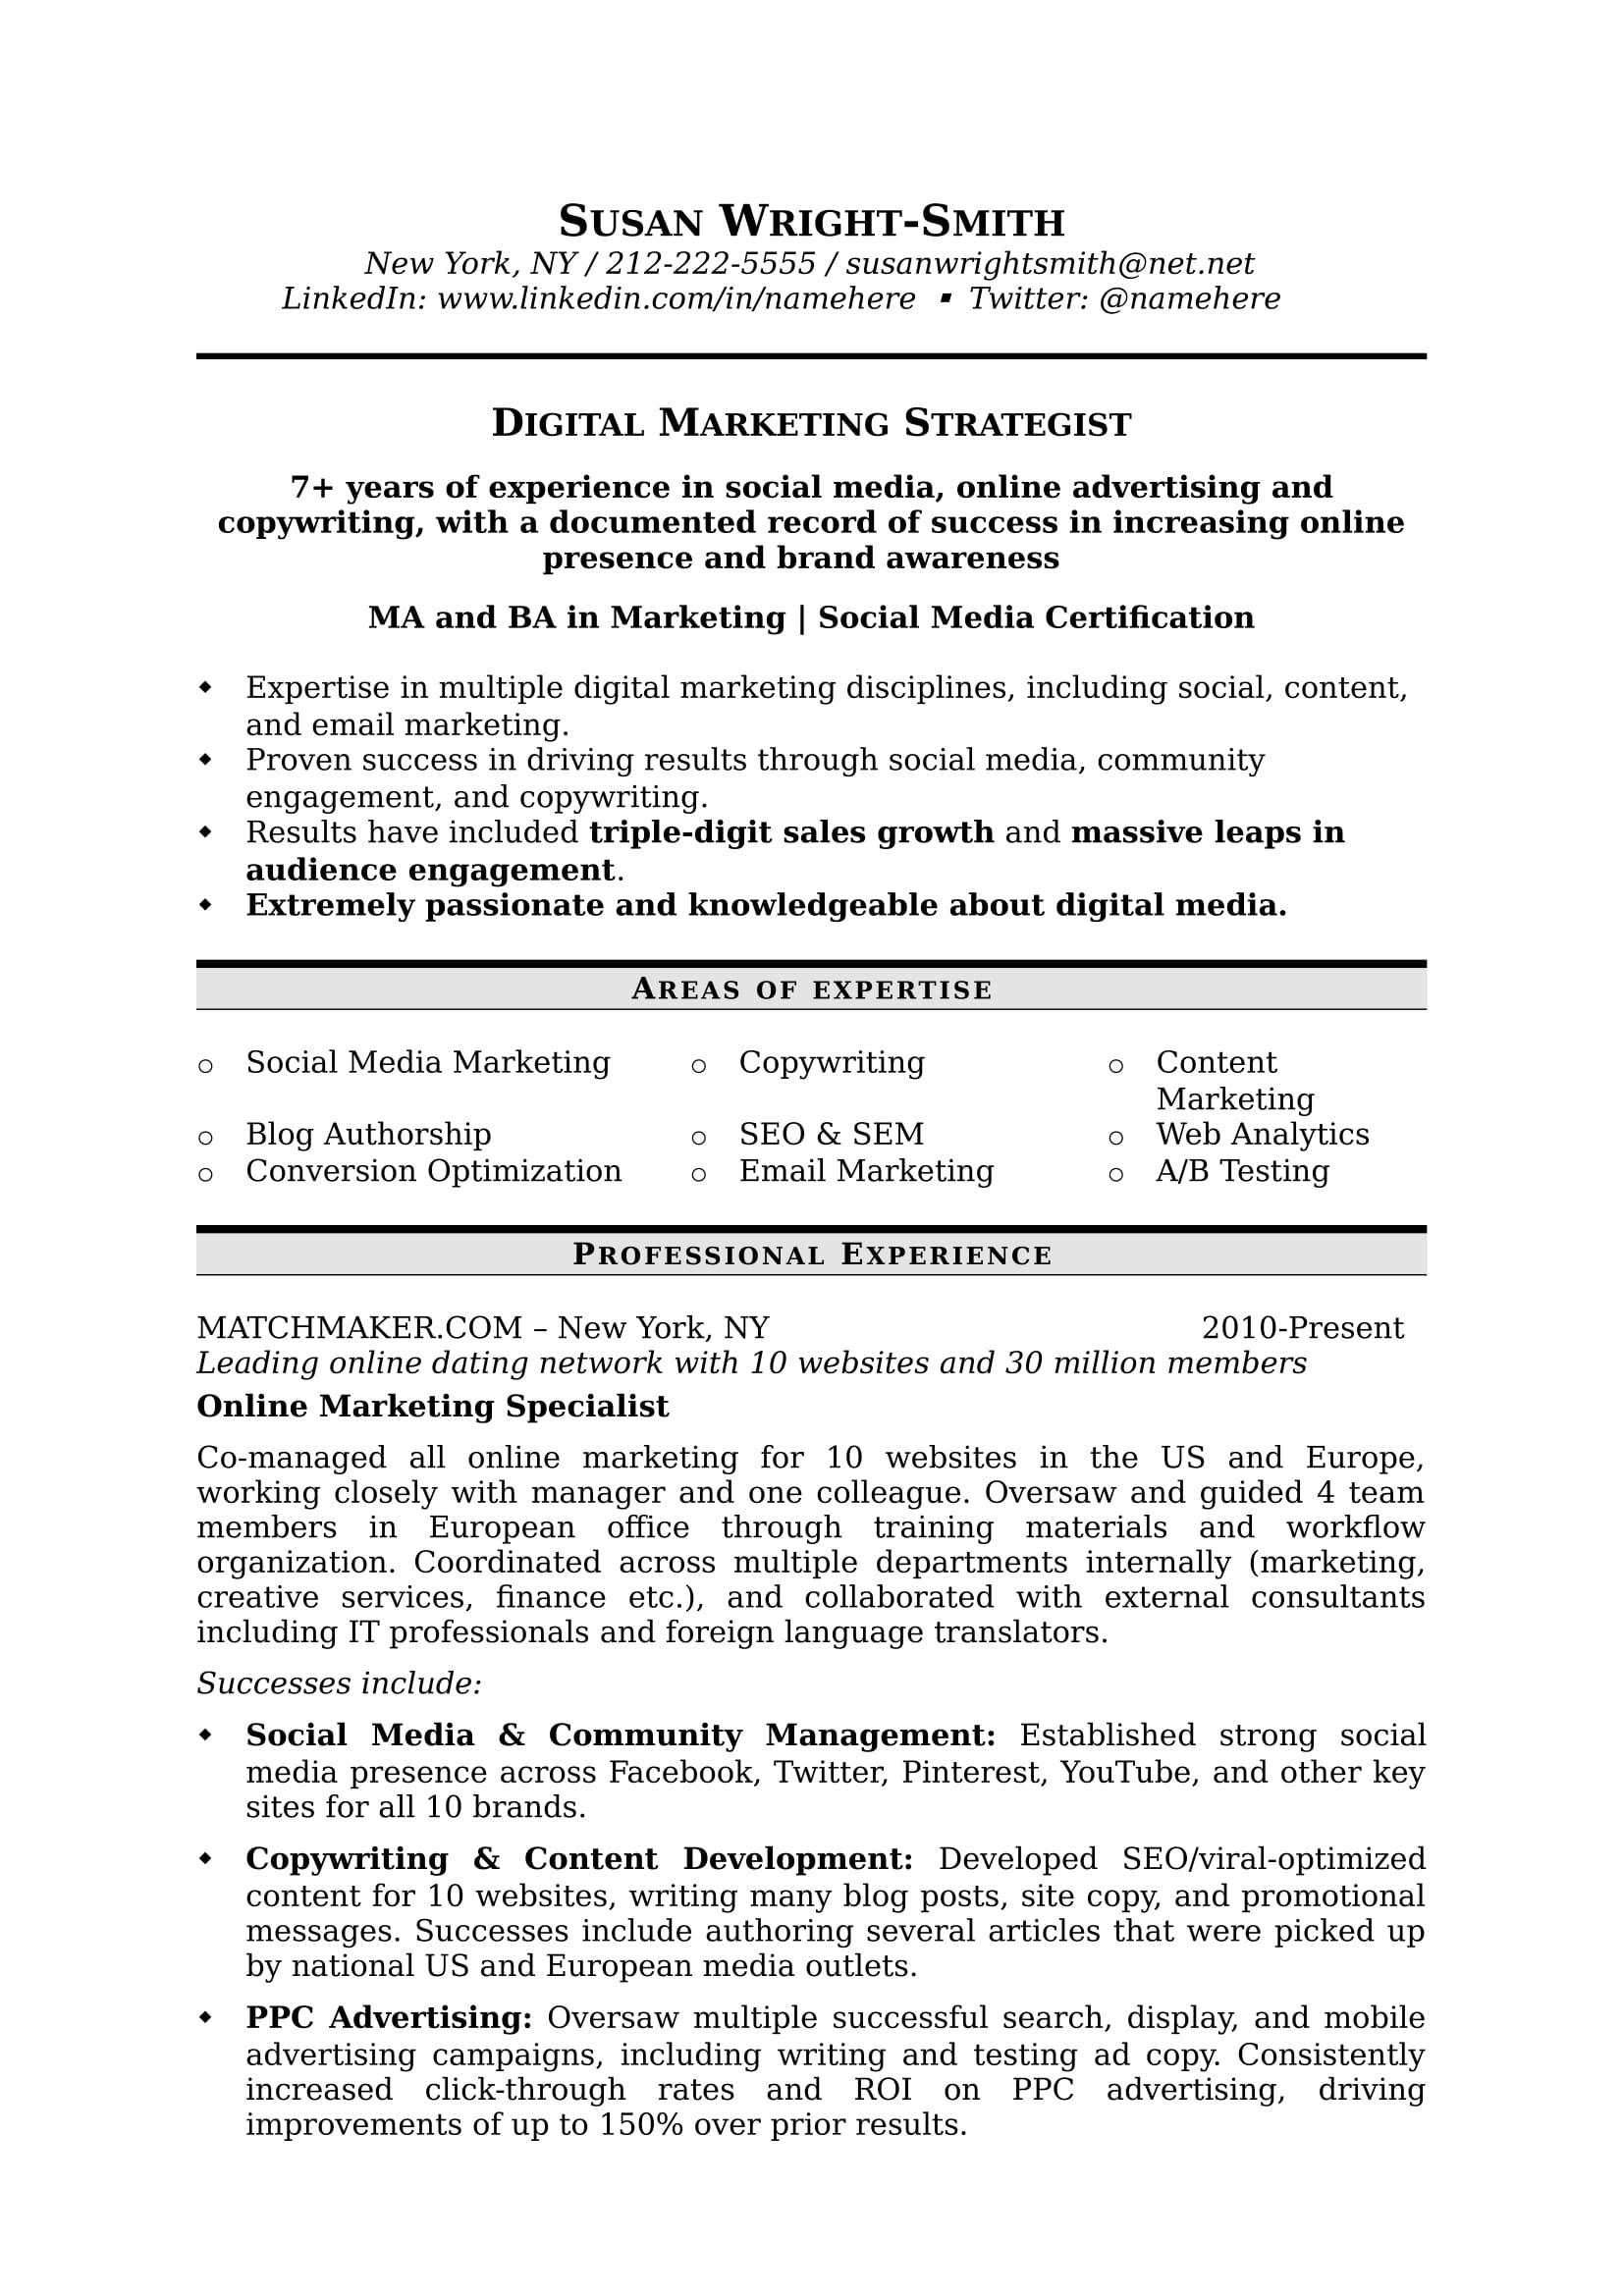 resume professional accomplishments